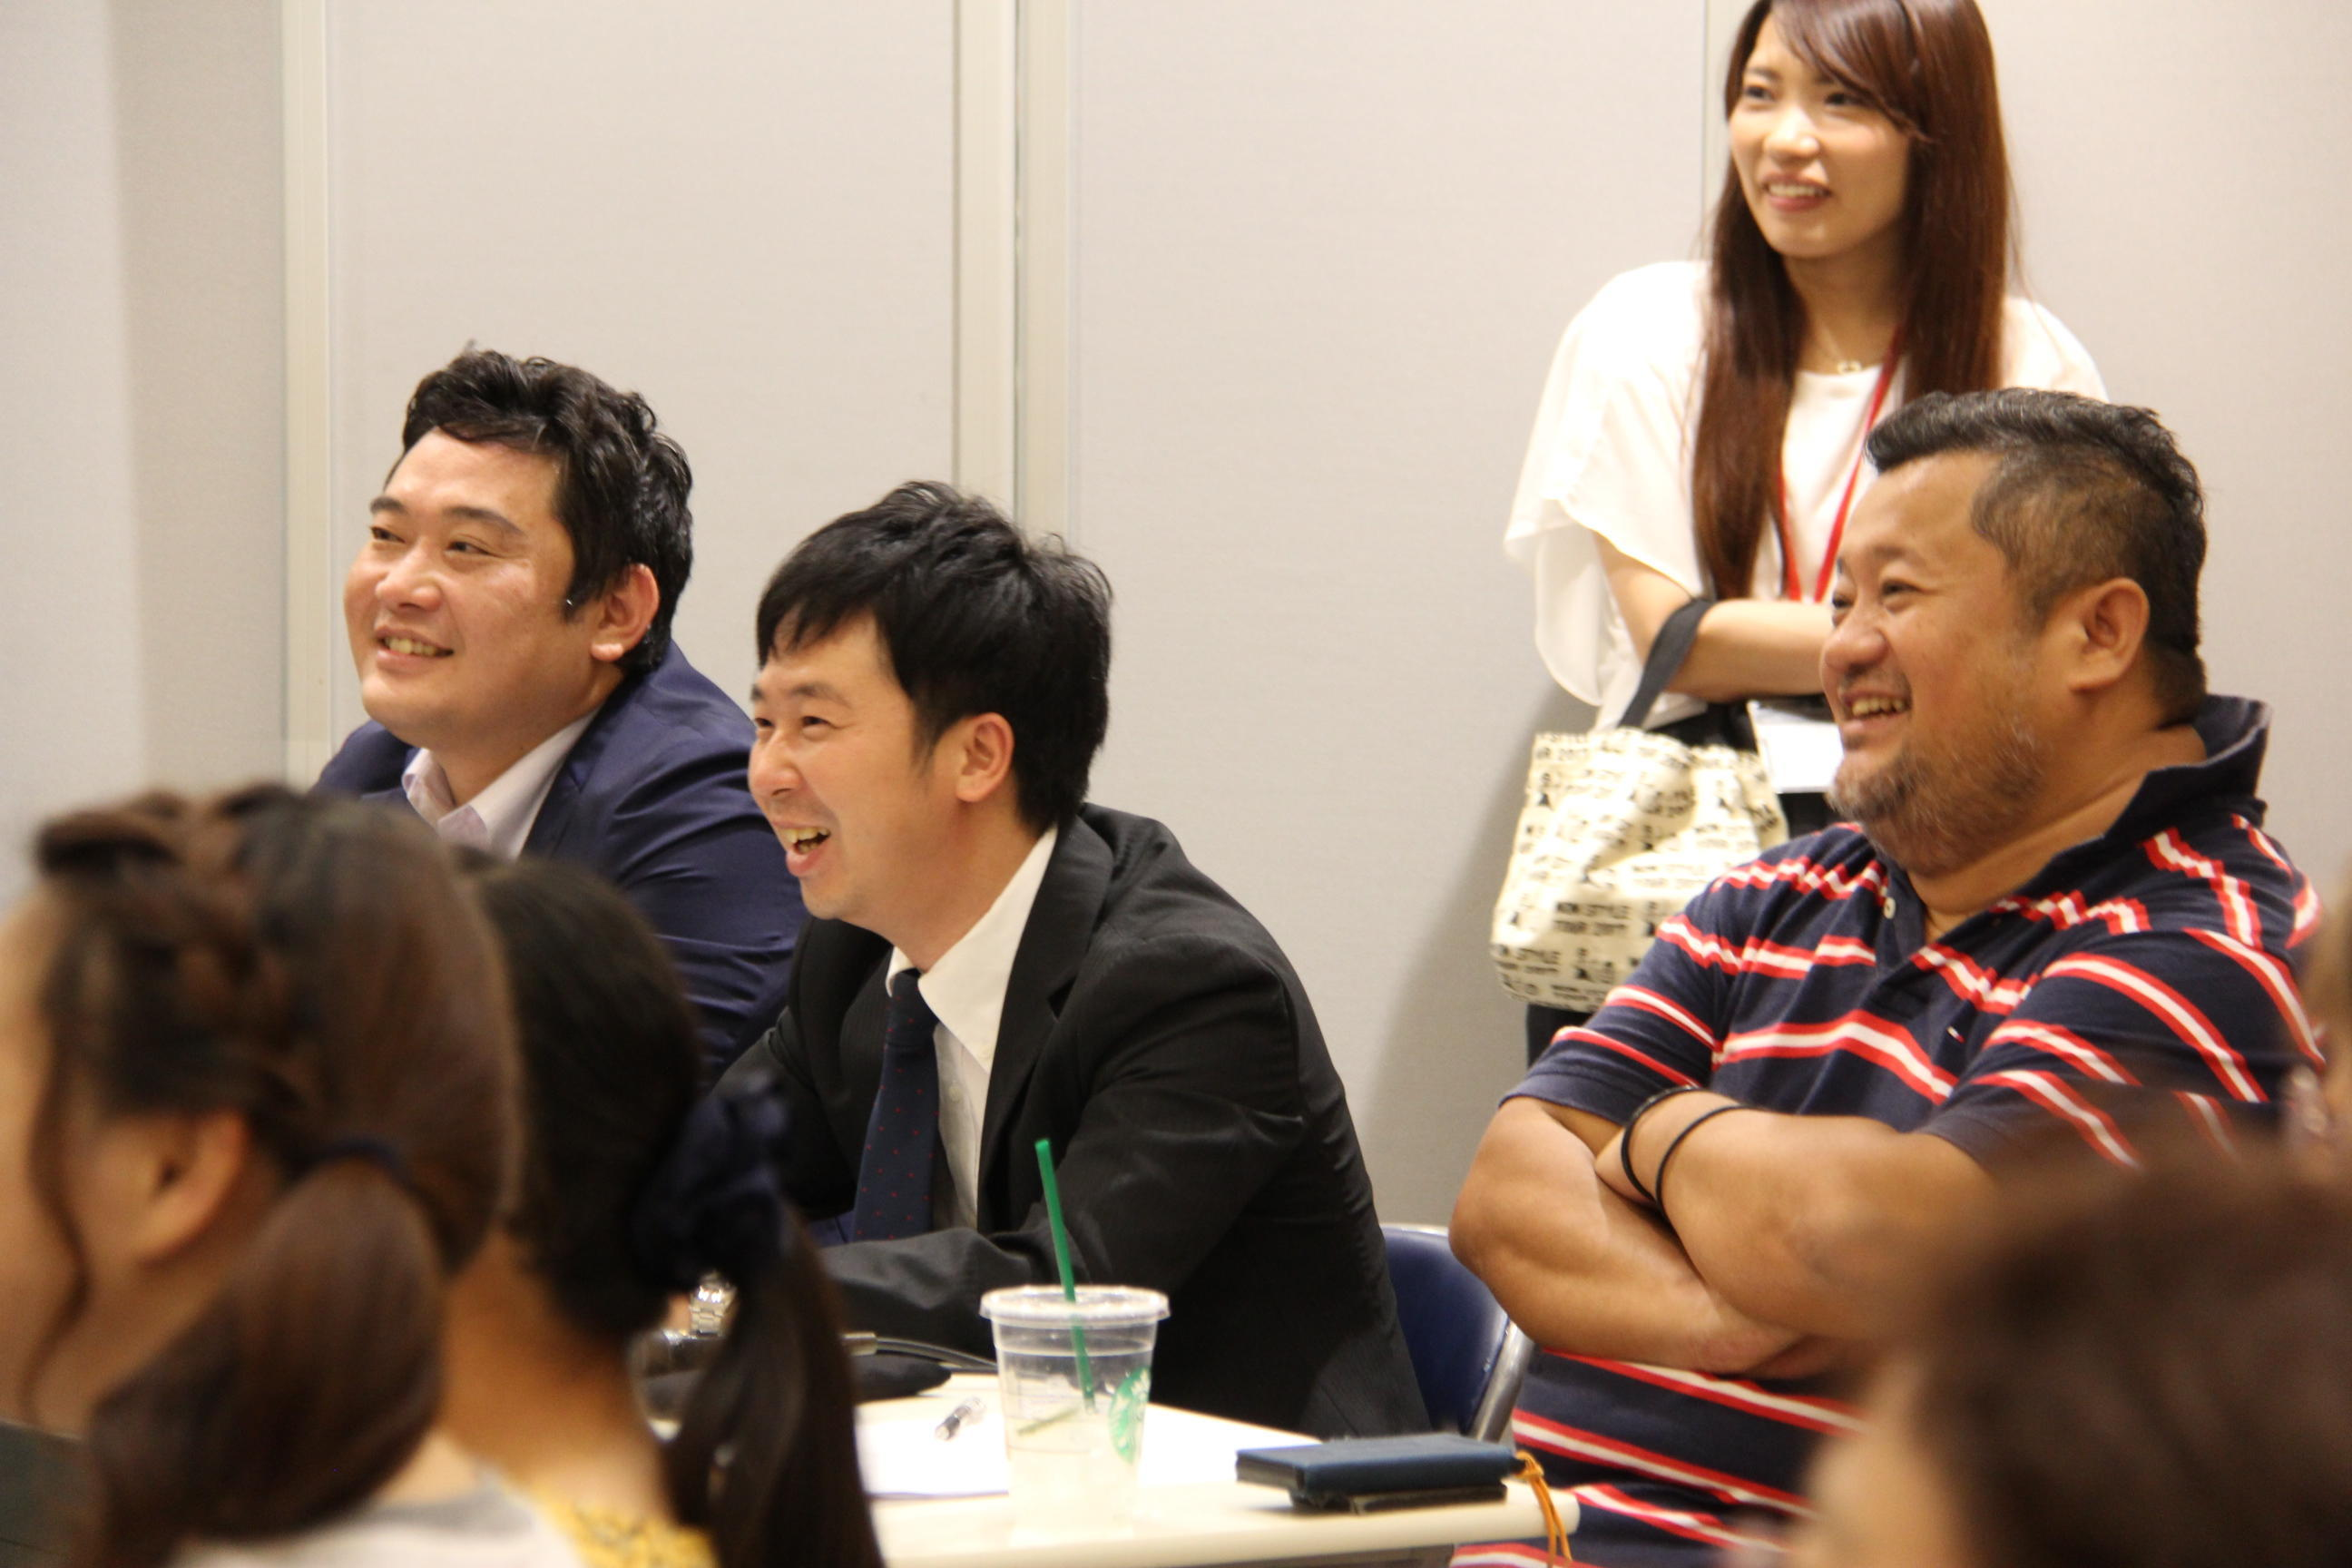 http://news.yoshimoto.co.jp/20180813132022-dd9c37df53a7073337acda909f4d800e41c415a8.jpg